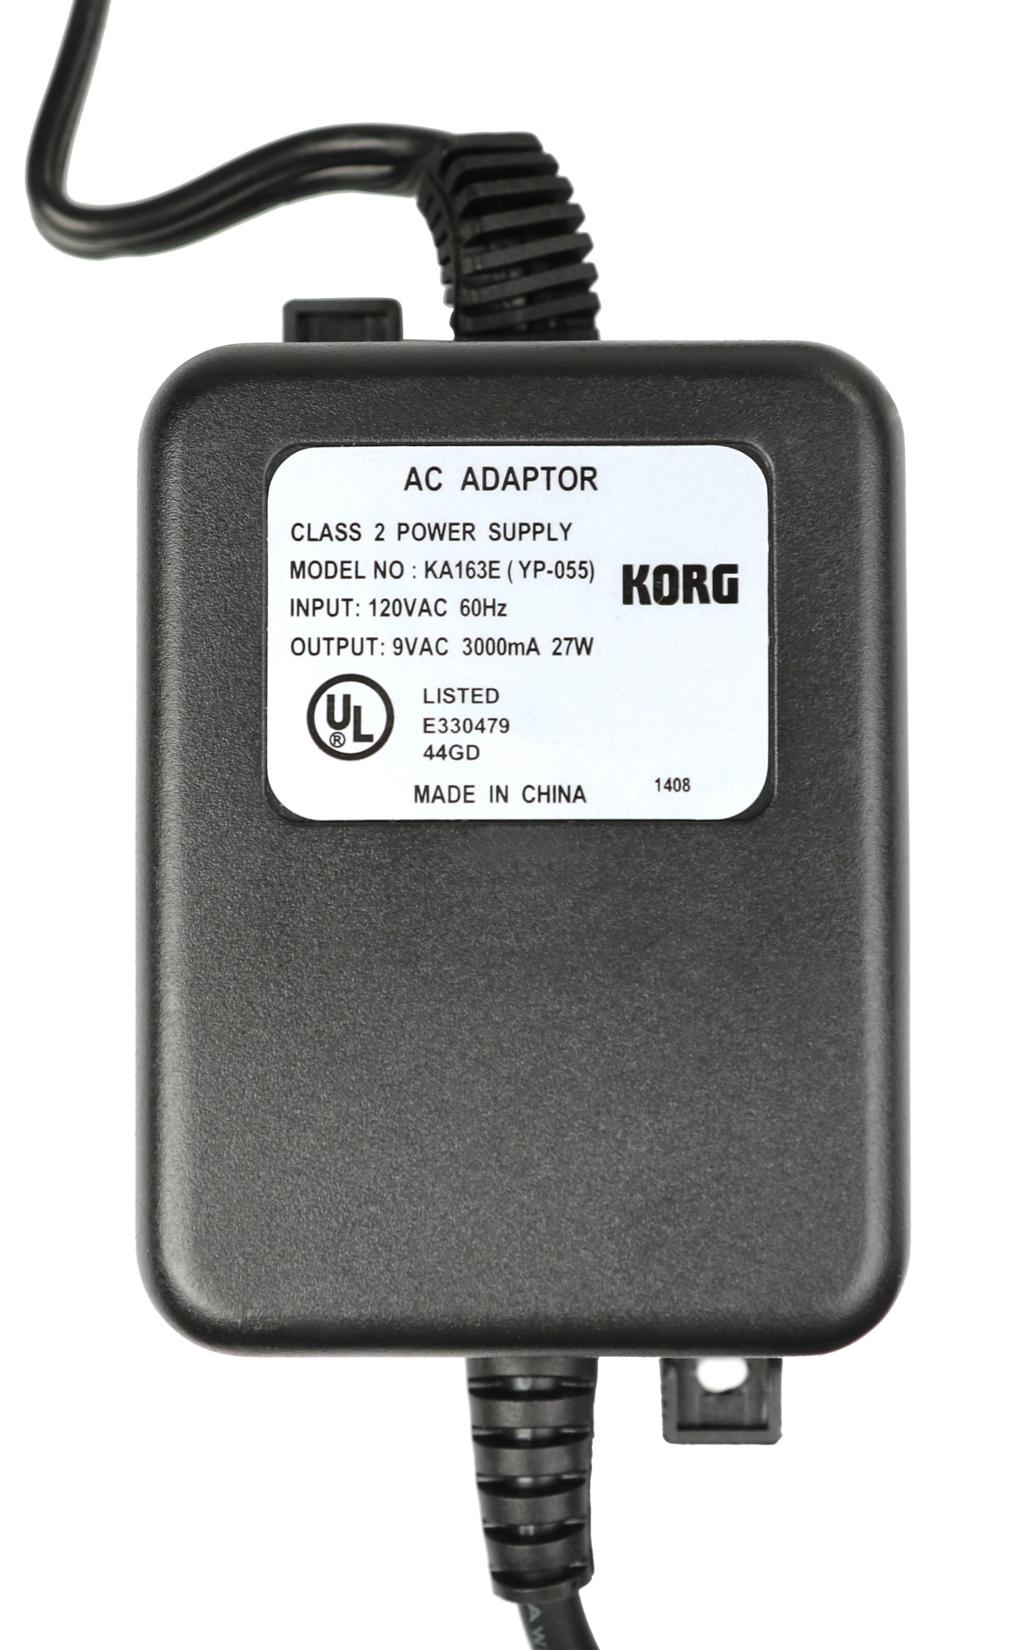 KA163 AC Adaptor for Triton